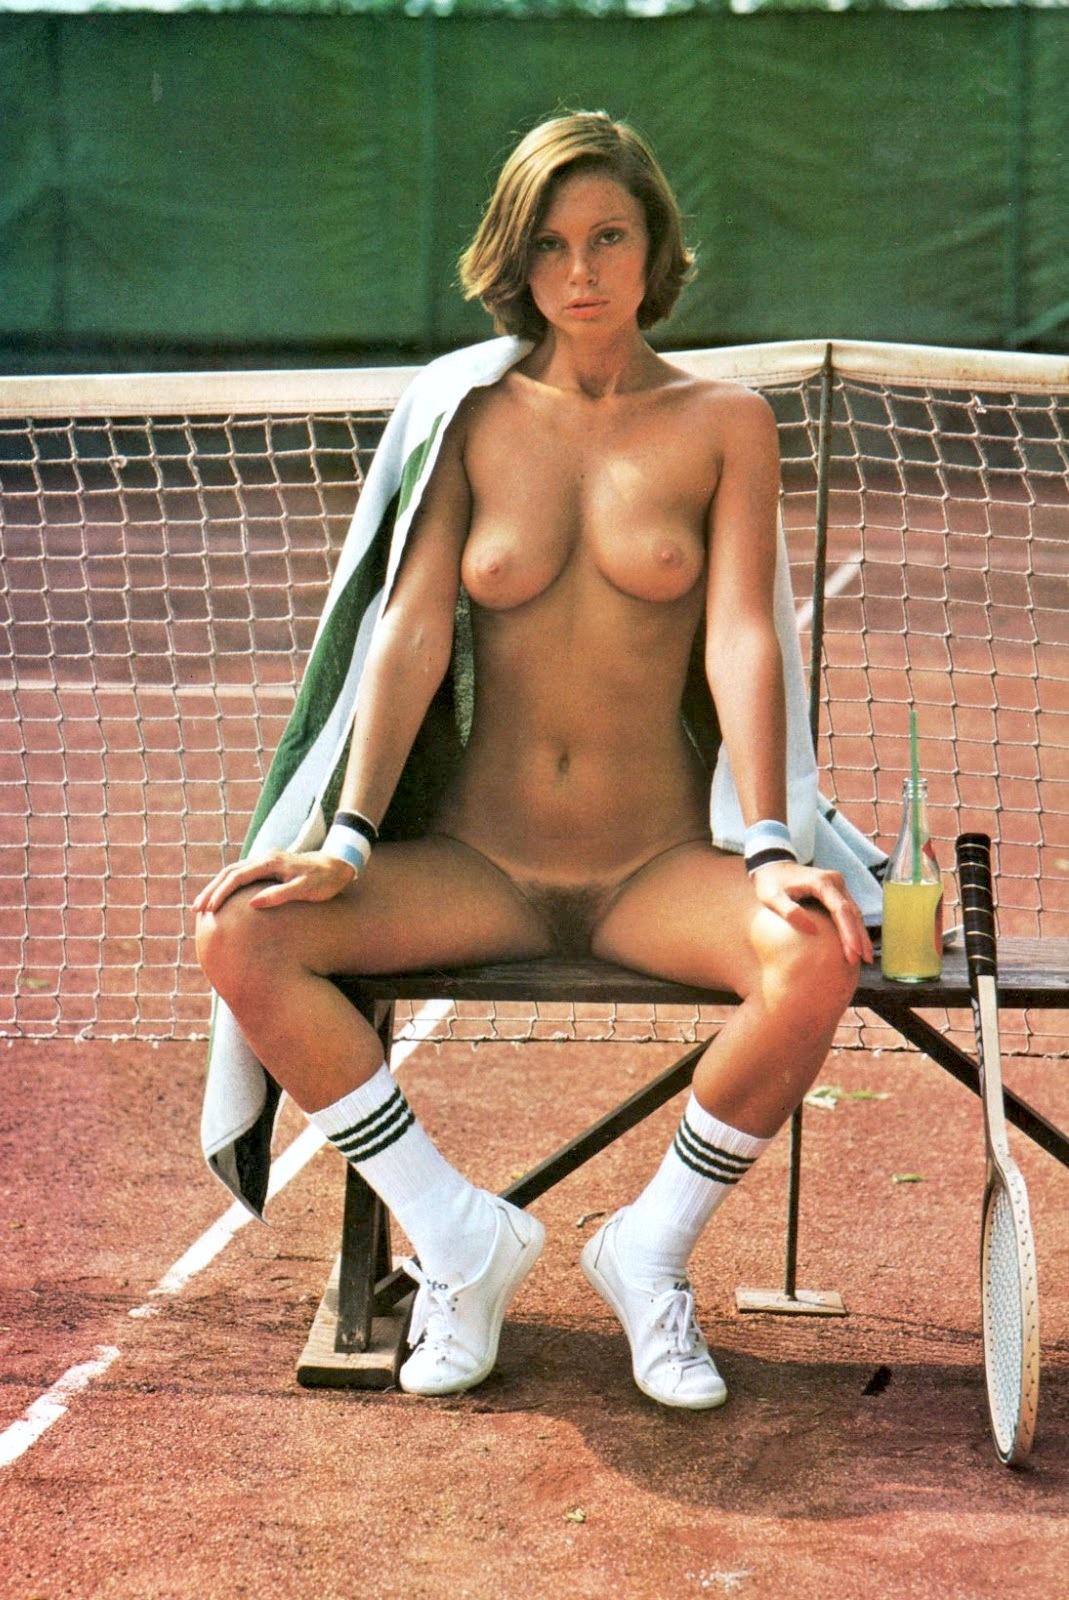 Athletes playboy nude pussy, nikki fuller sex